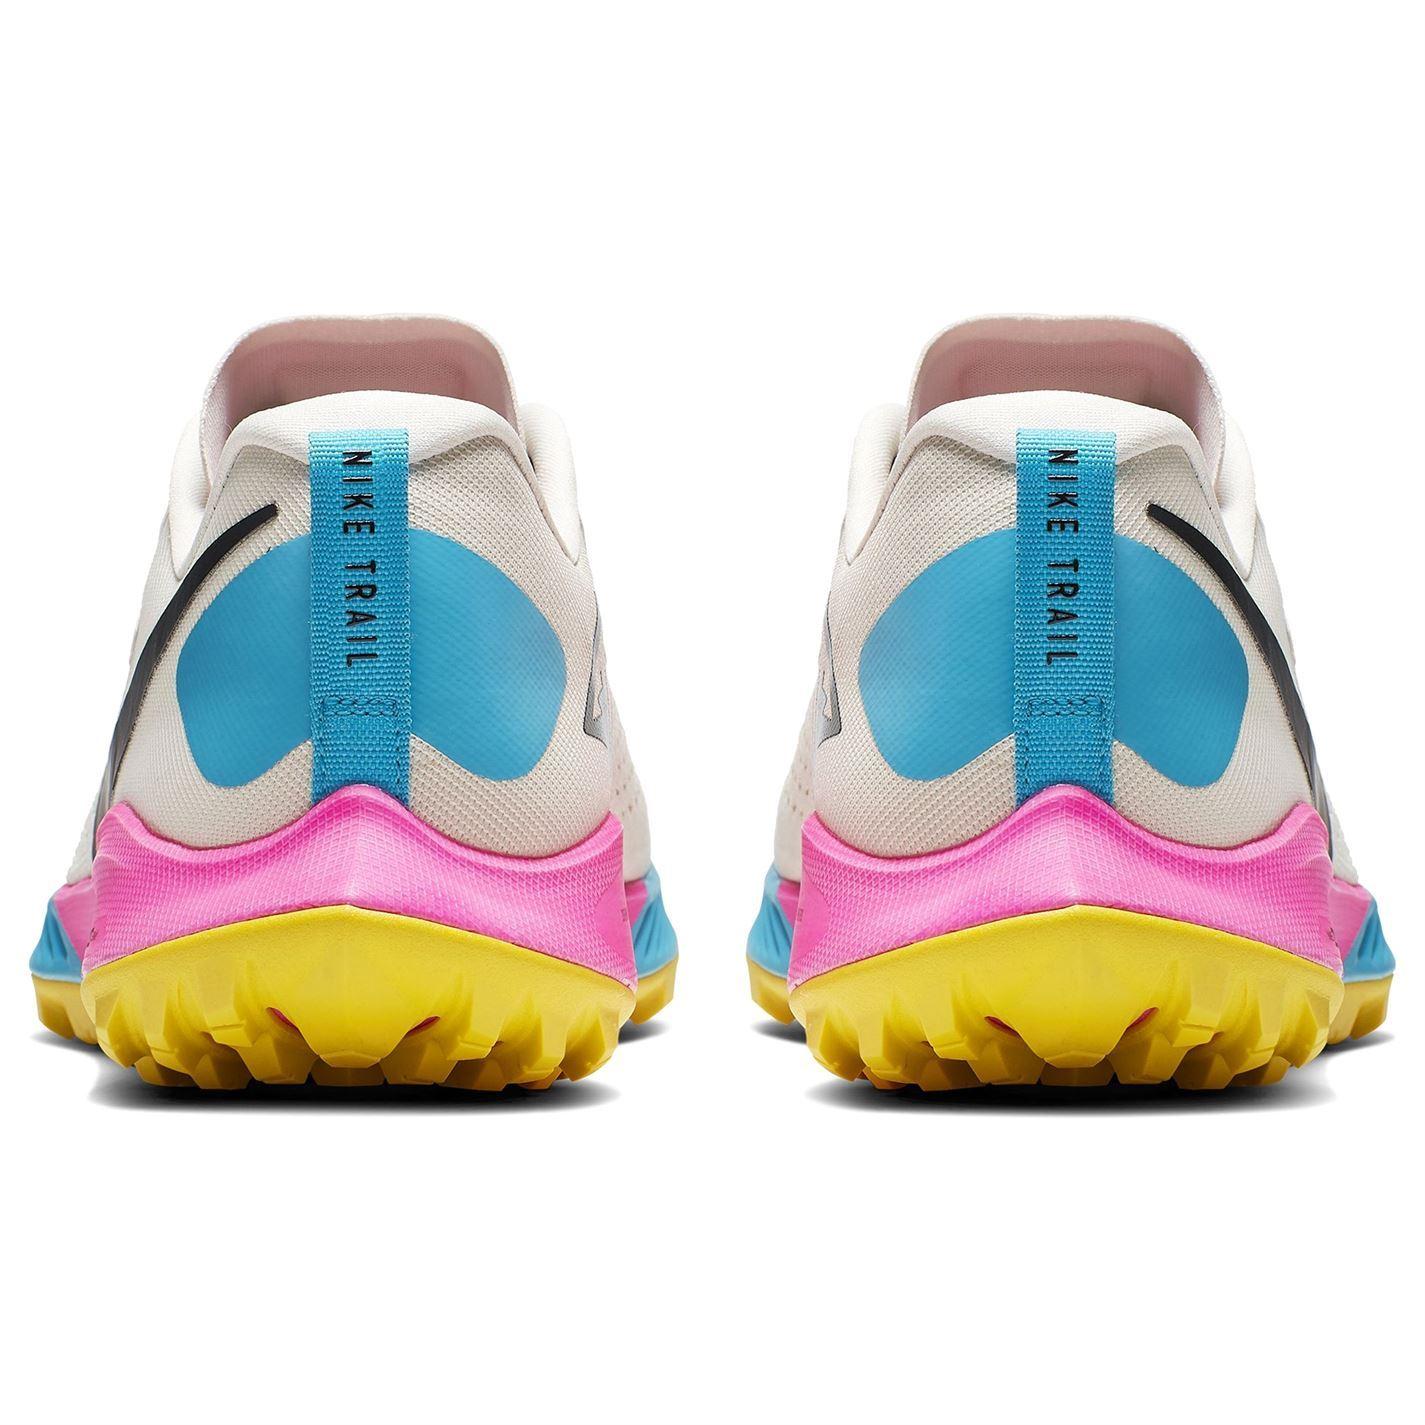 Detalles de Nike Aire Zoom Terra Kiger 5 Zapatillas Trail Running Blanco Azul Rosa